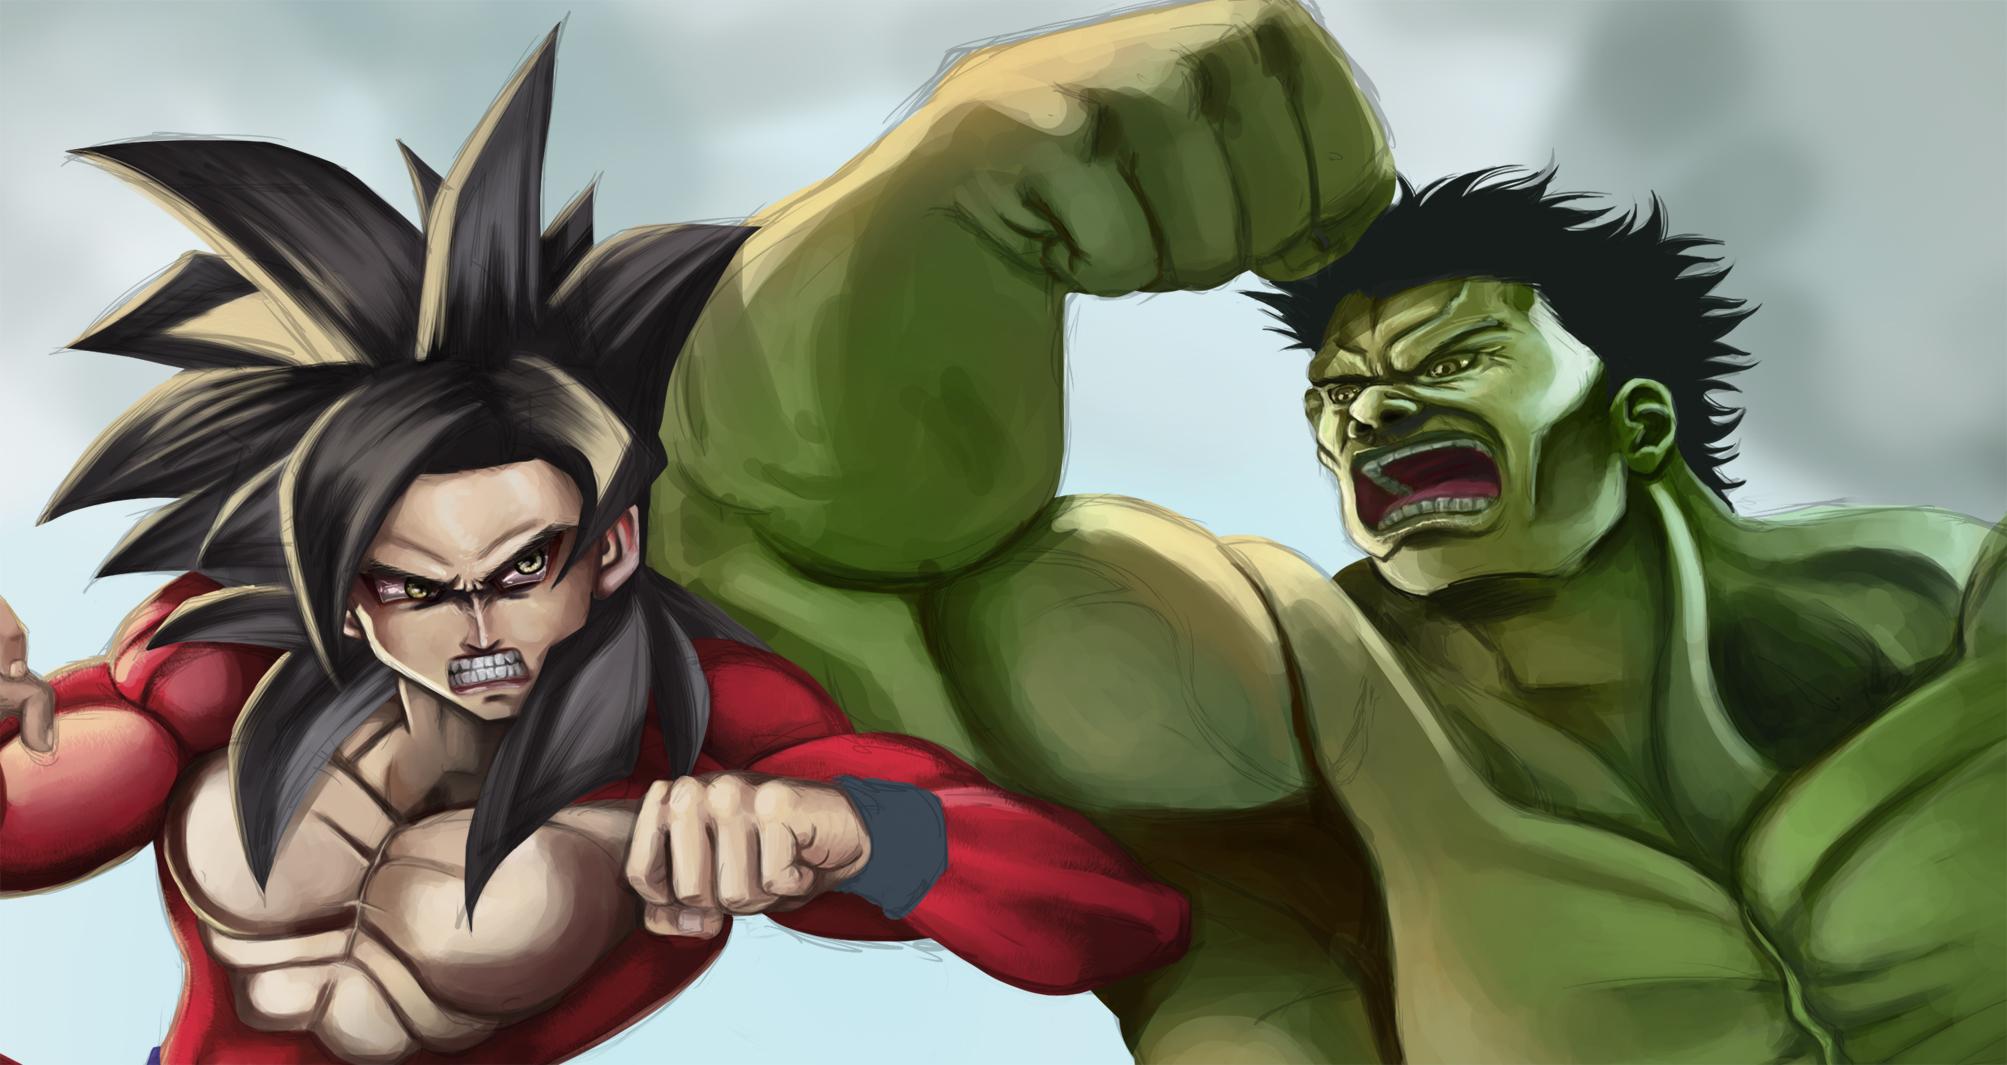 Goku vs Hulk Sketch Preview by spiritualfeel on DeviantArt